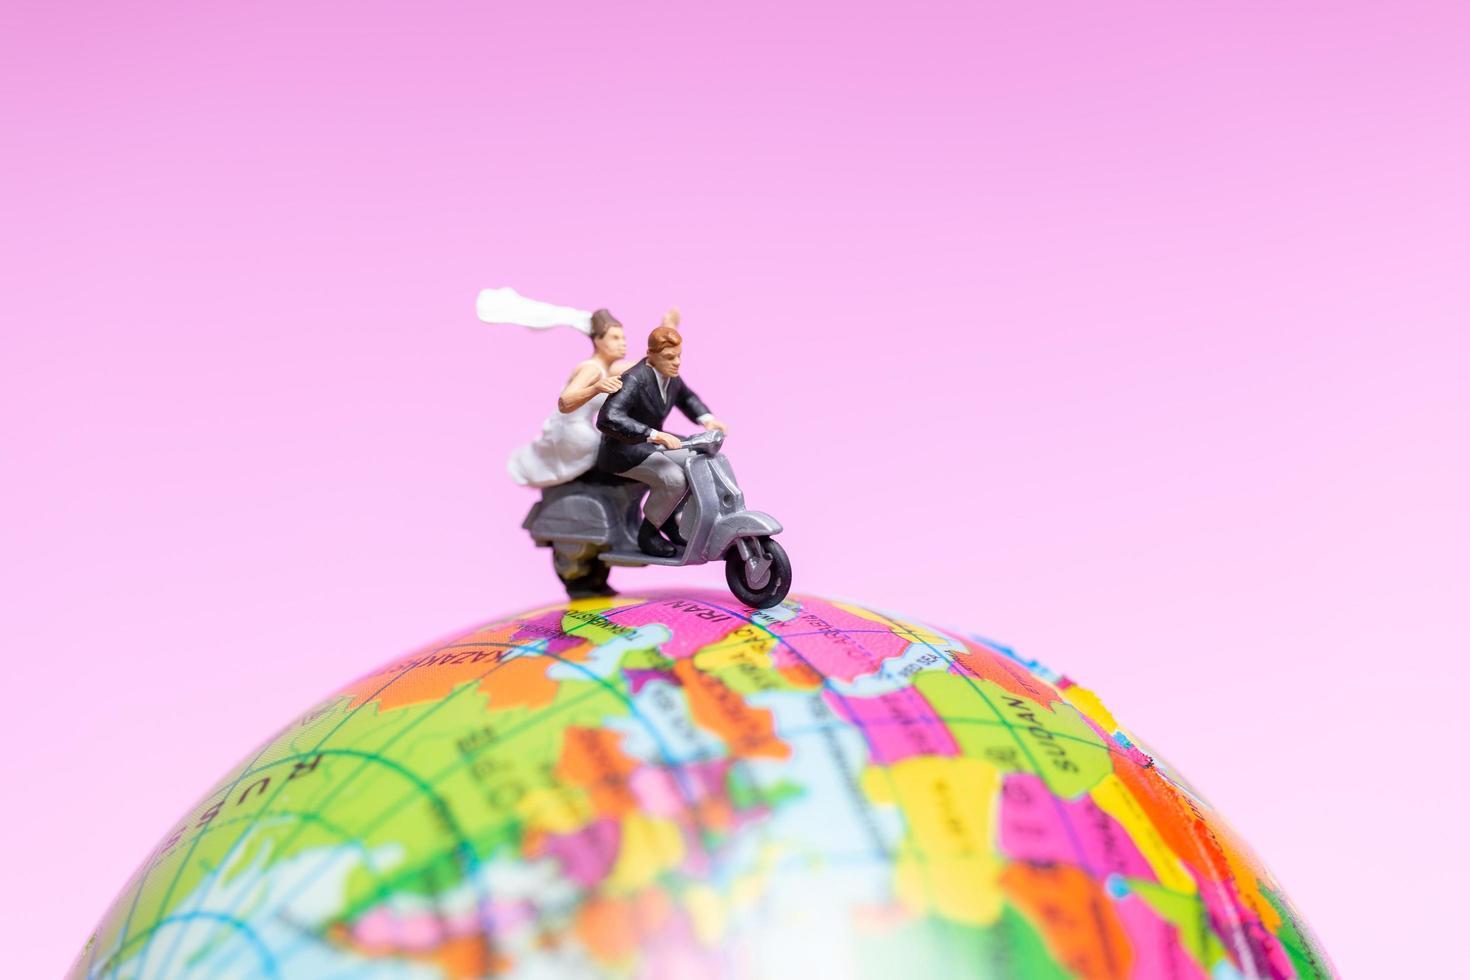 Pareja en miniatura en motocicleta en un globo terráqueo foto